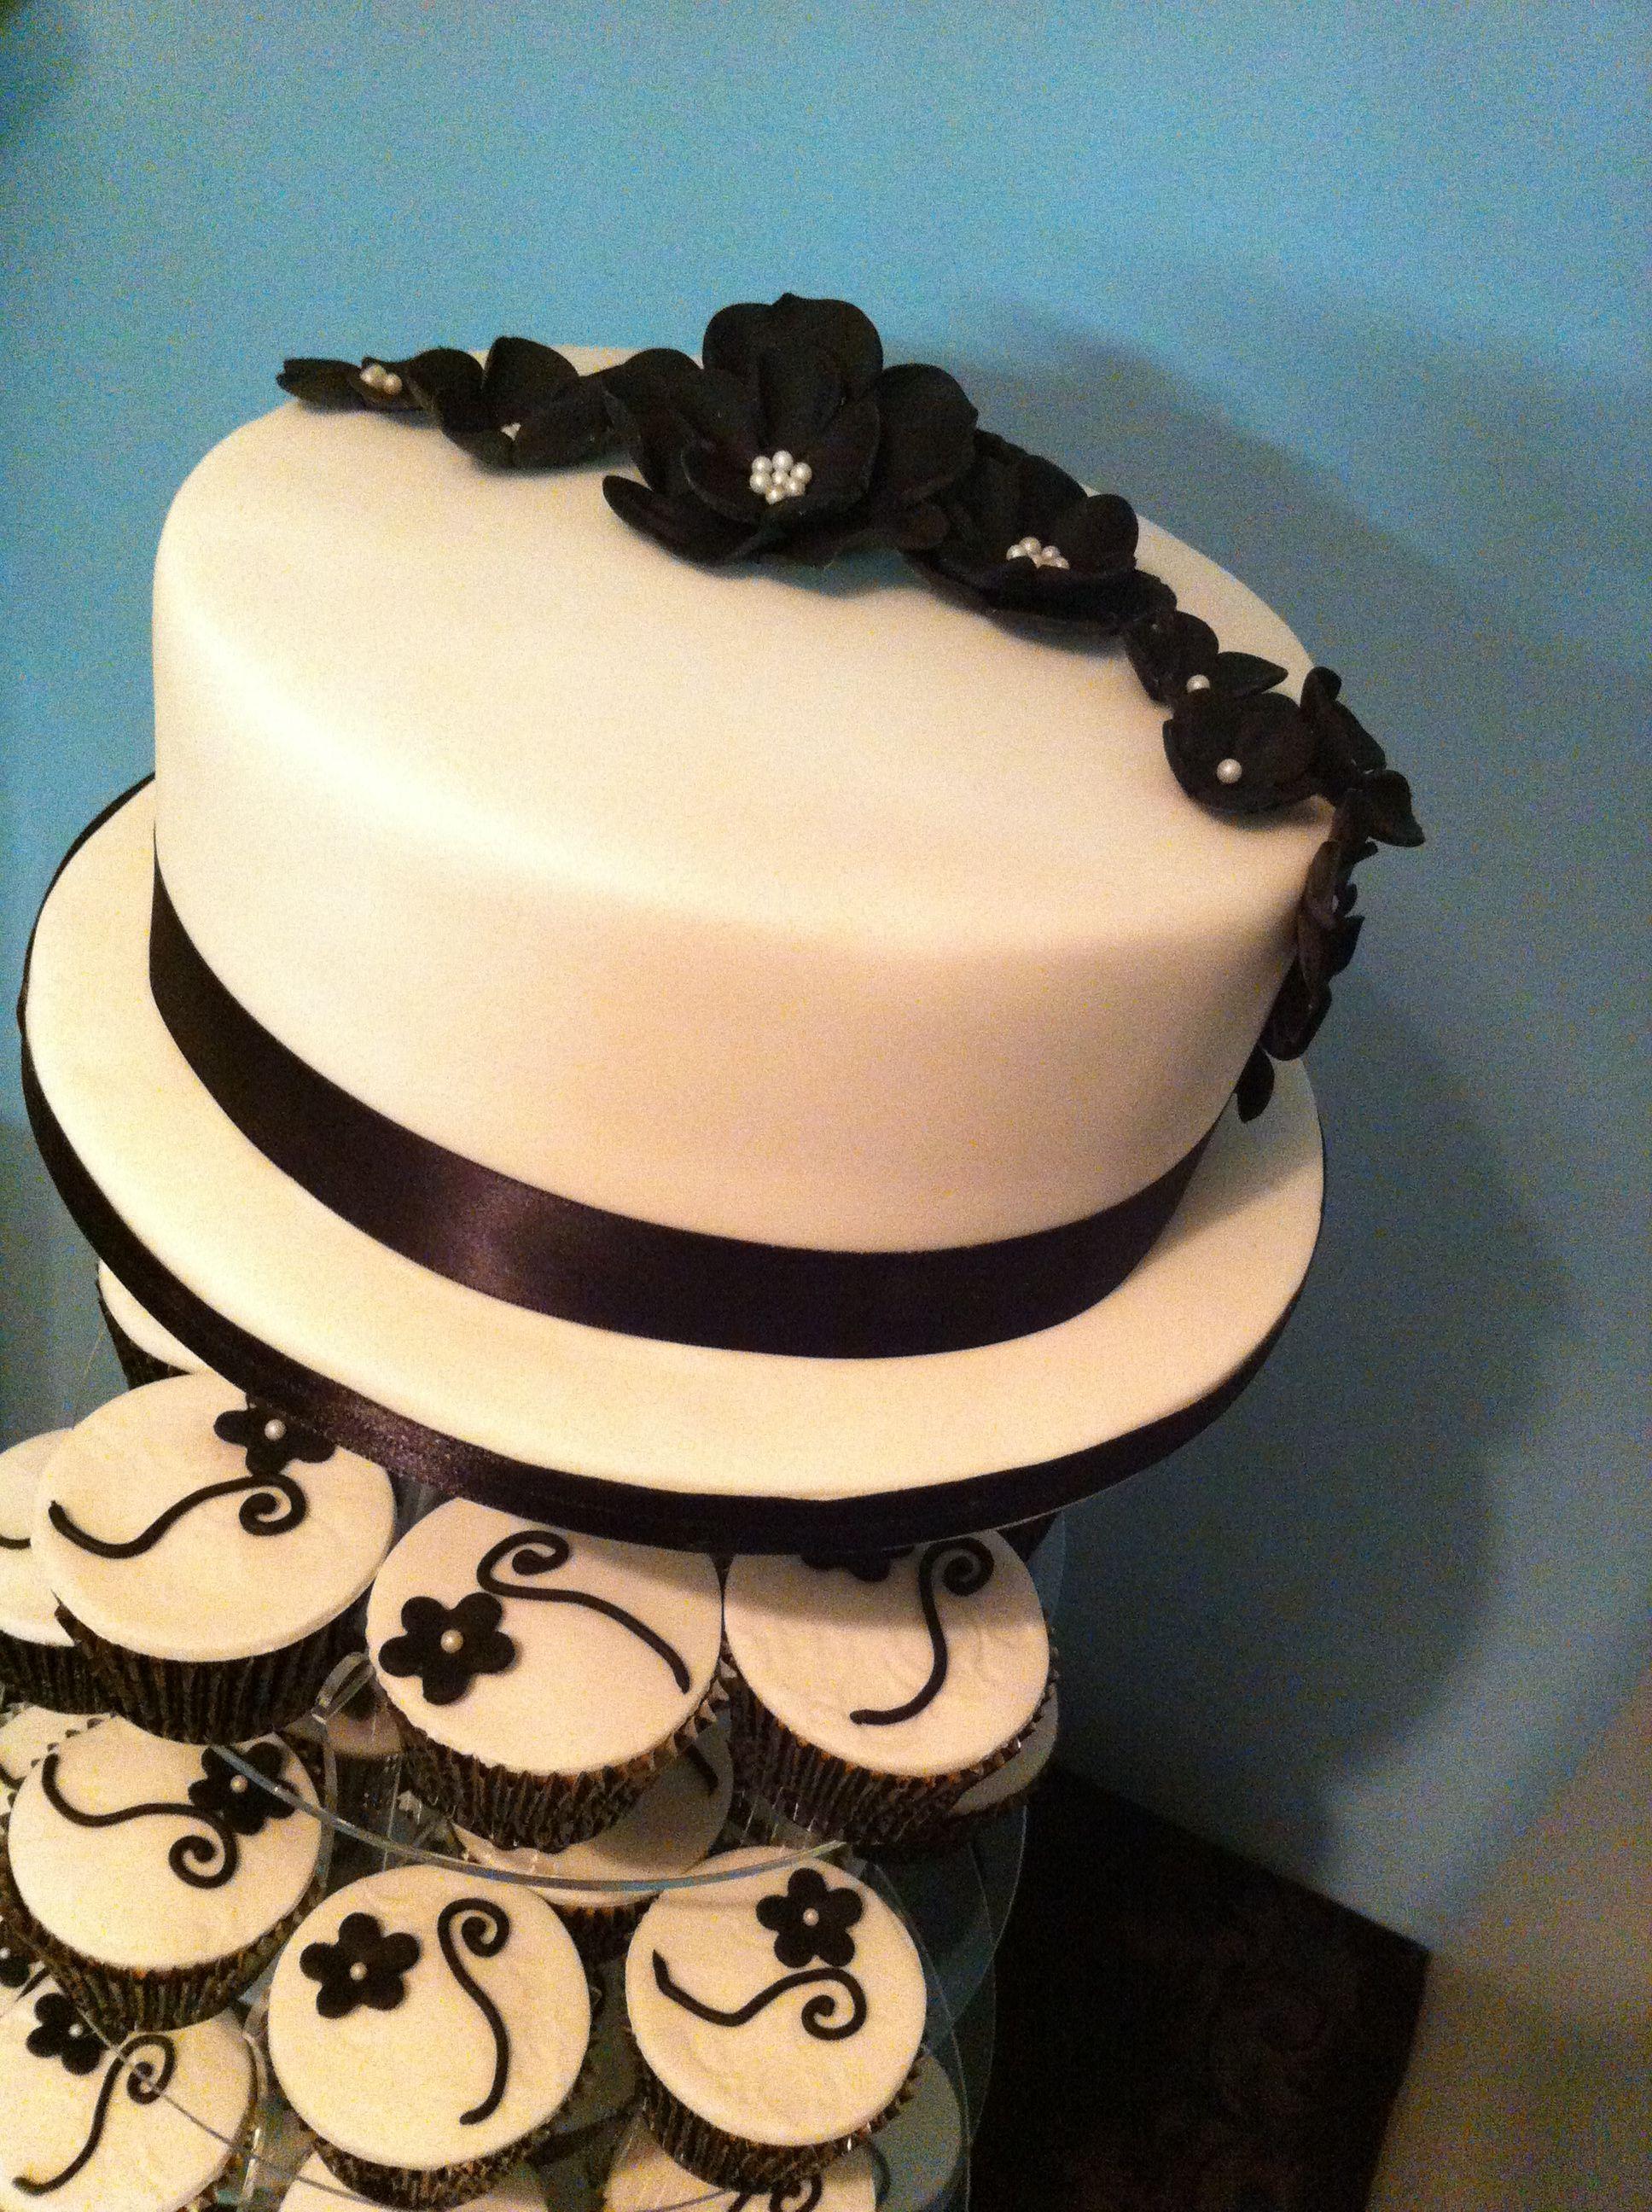 Black and white cupcake tower cake